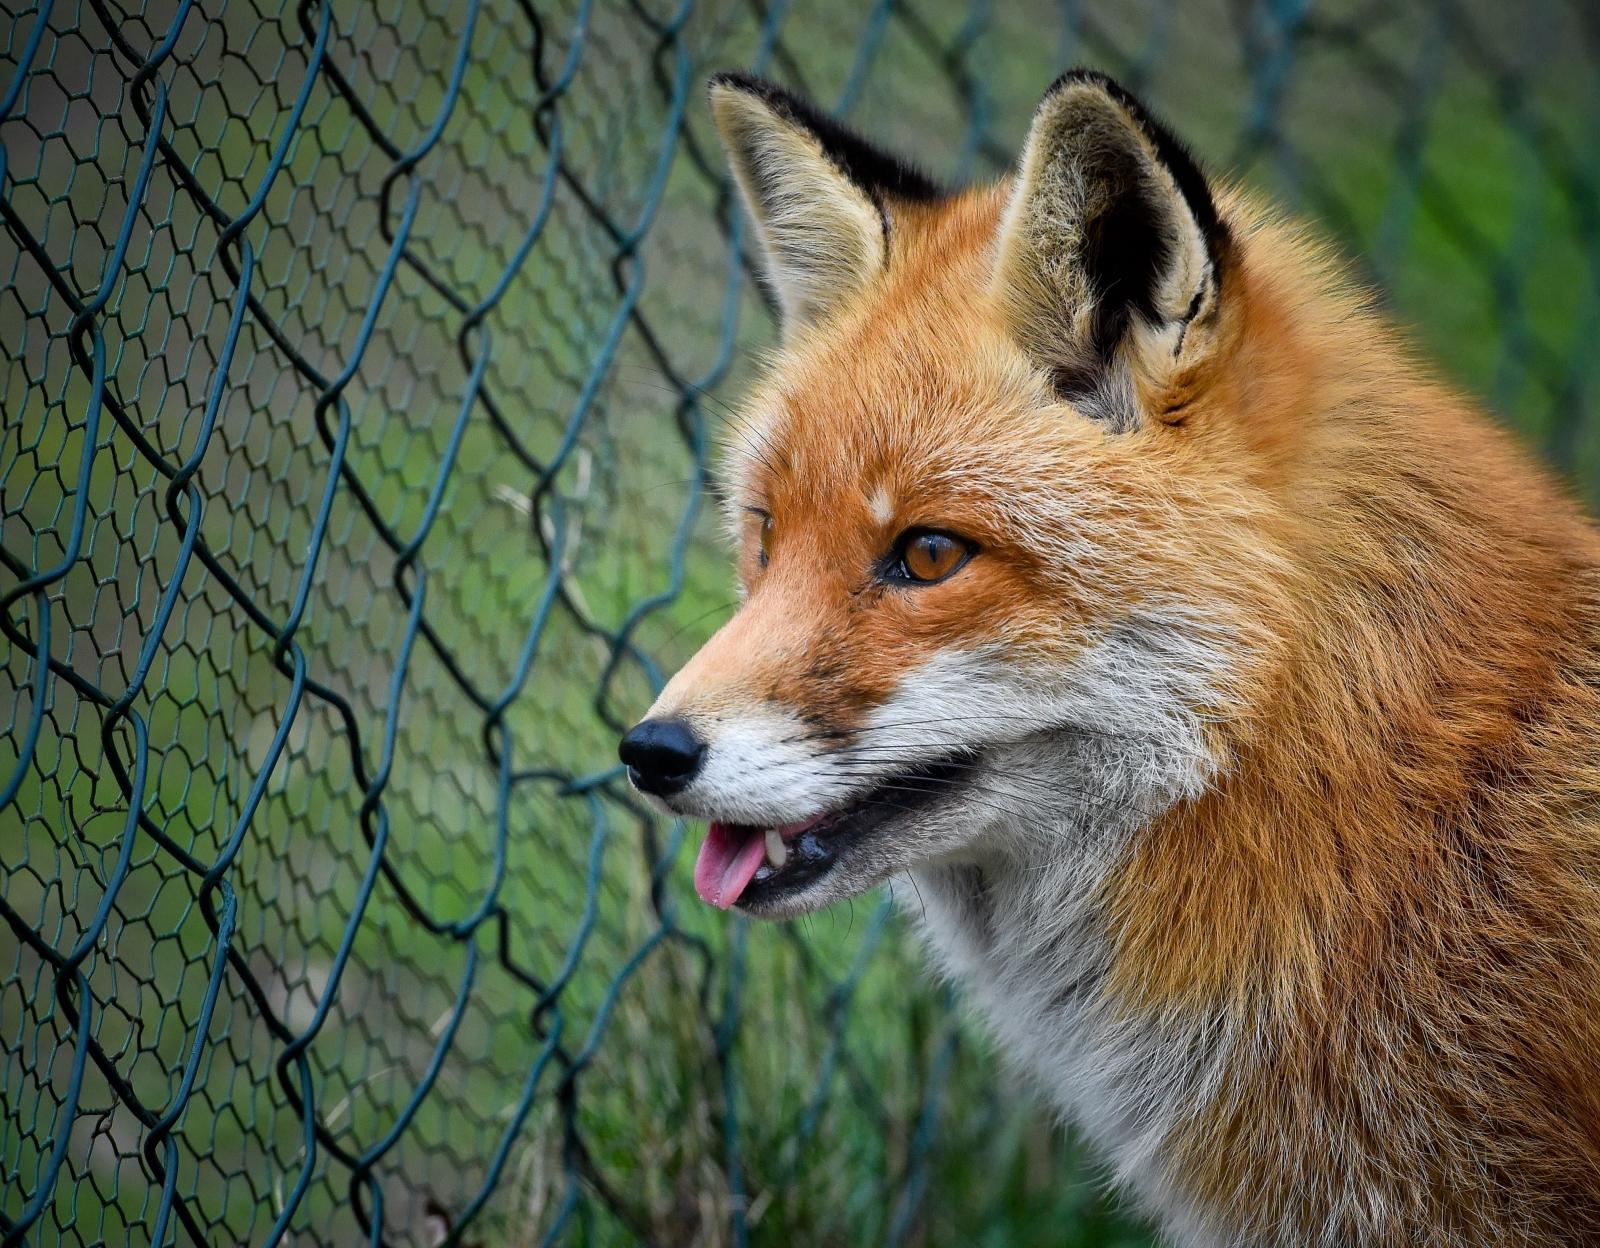 Foxes craving brake fluid blamed for car problems